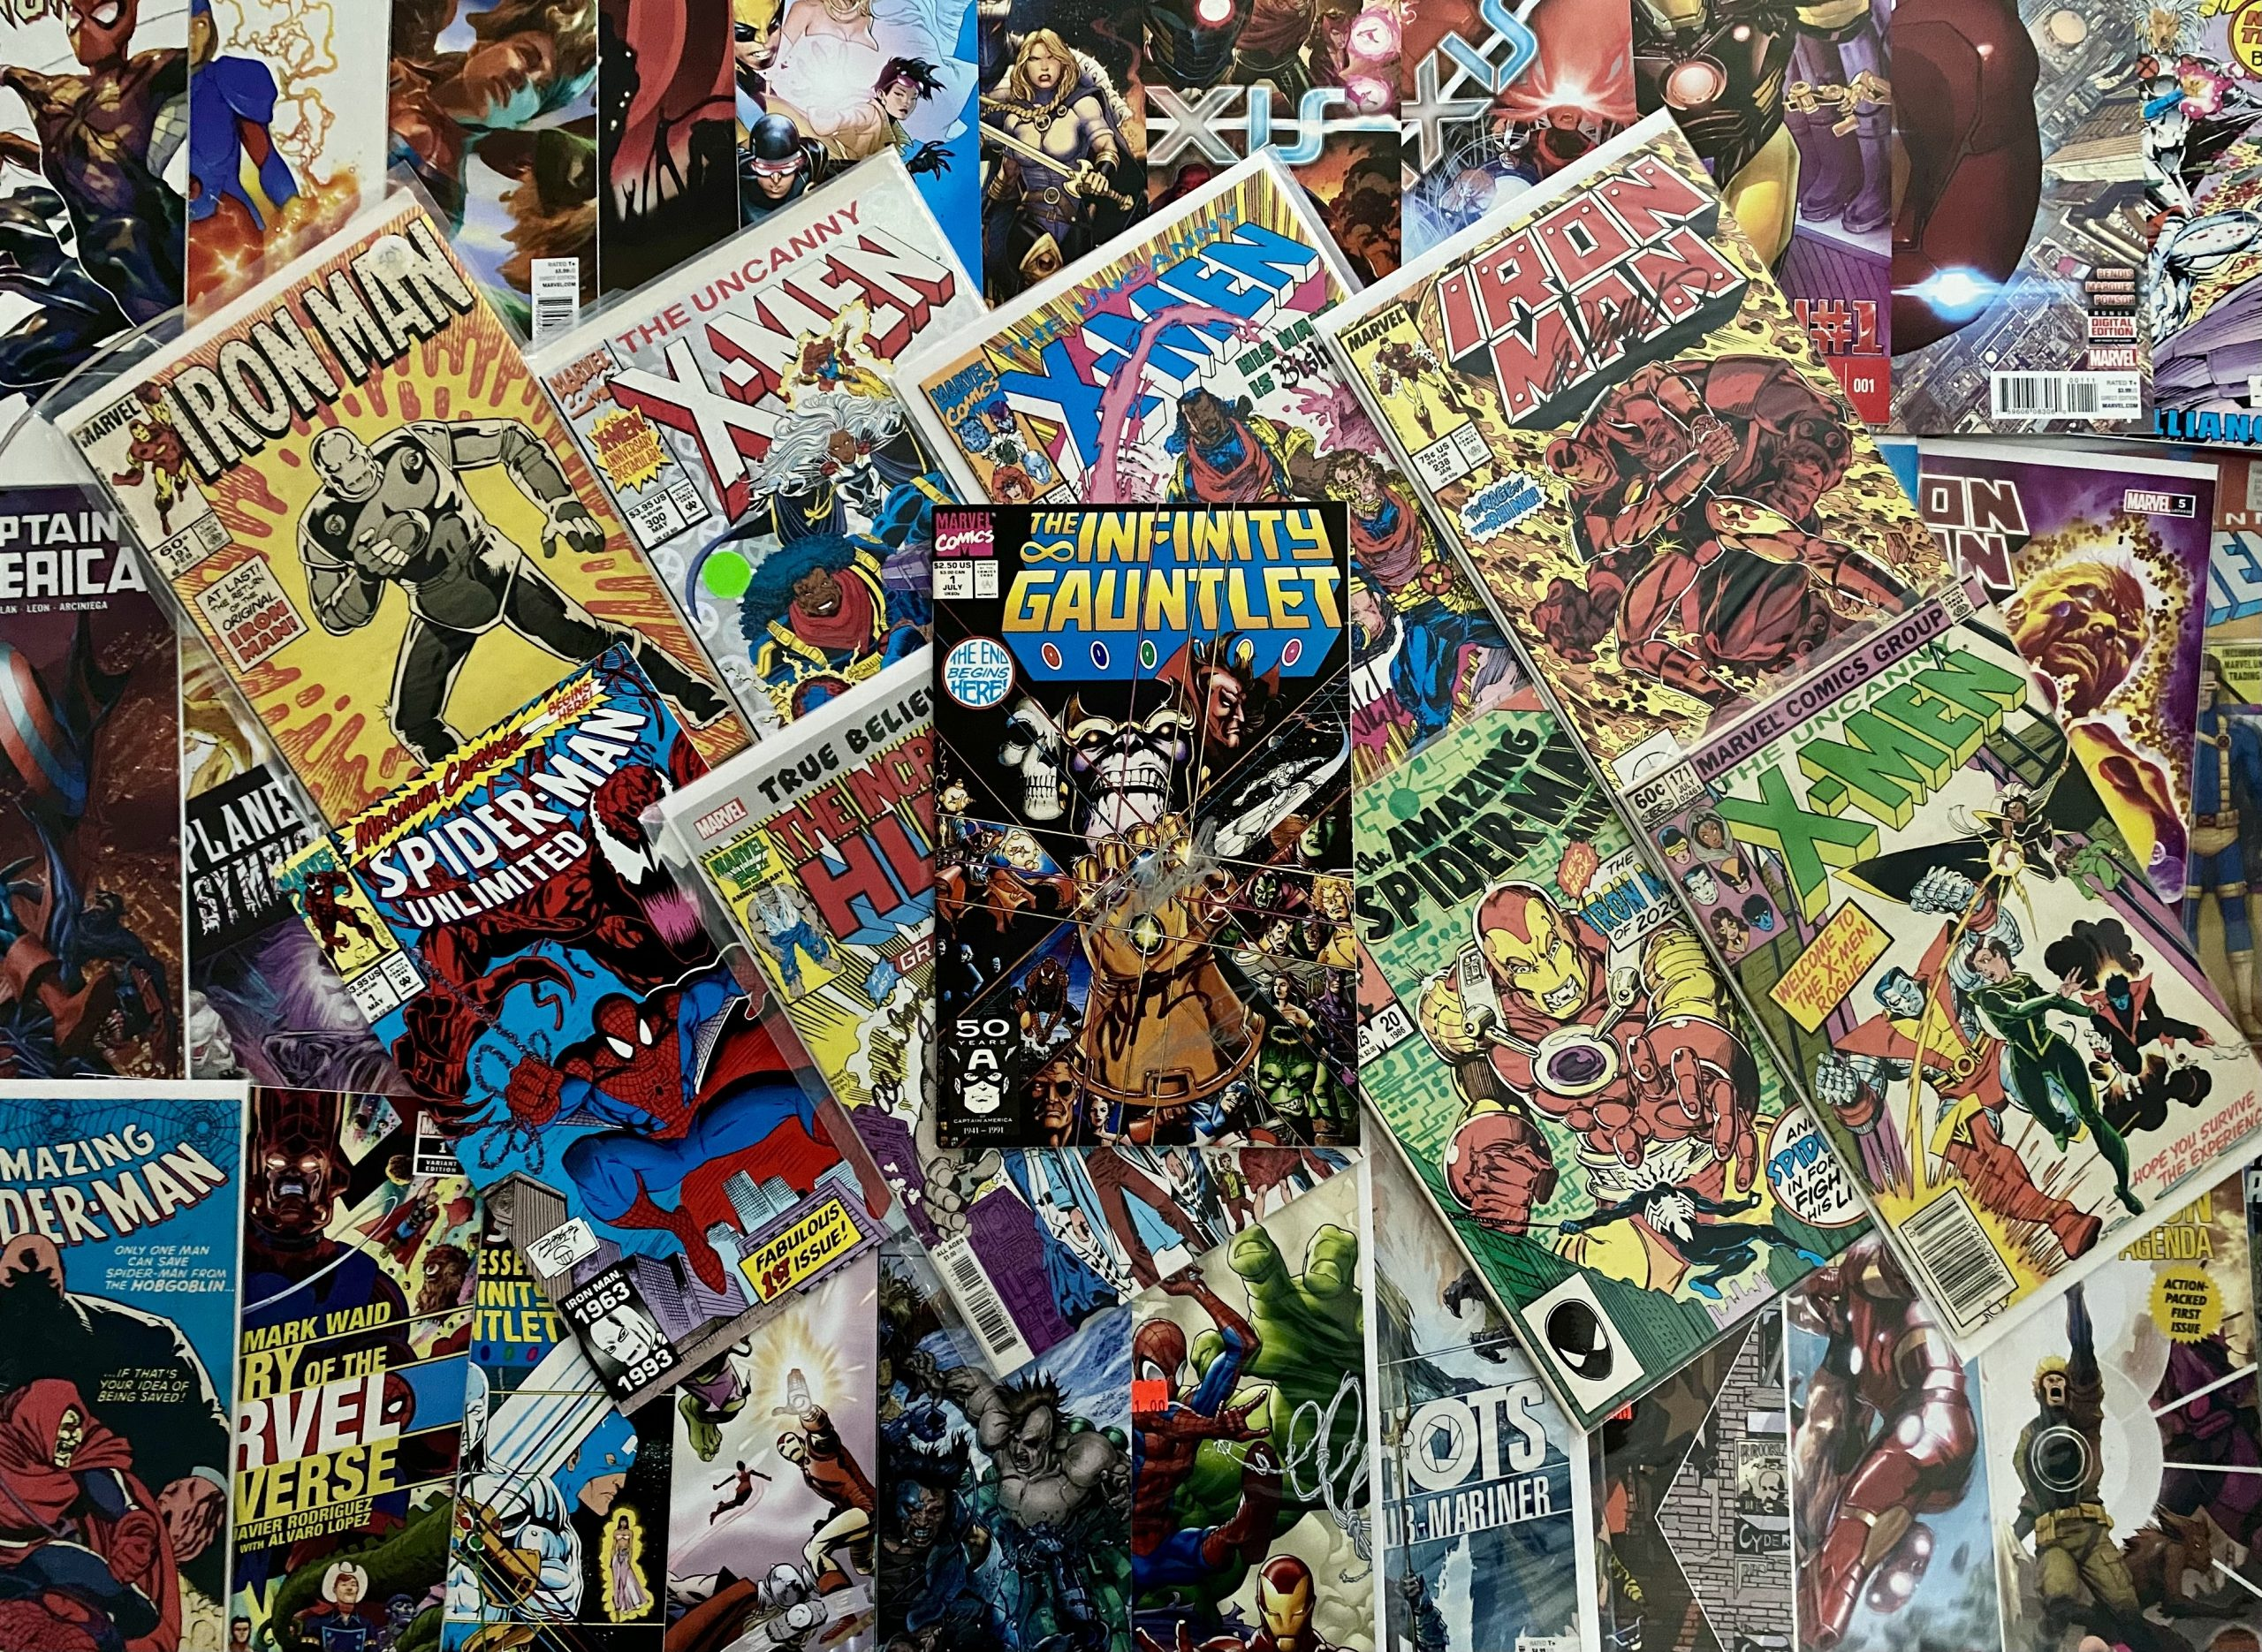 David is a comic book connoisseur...